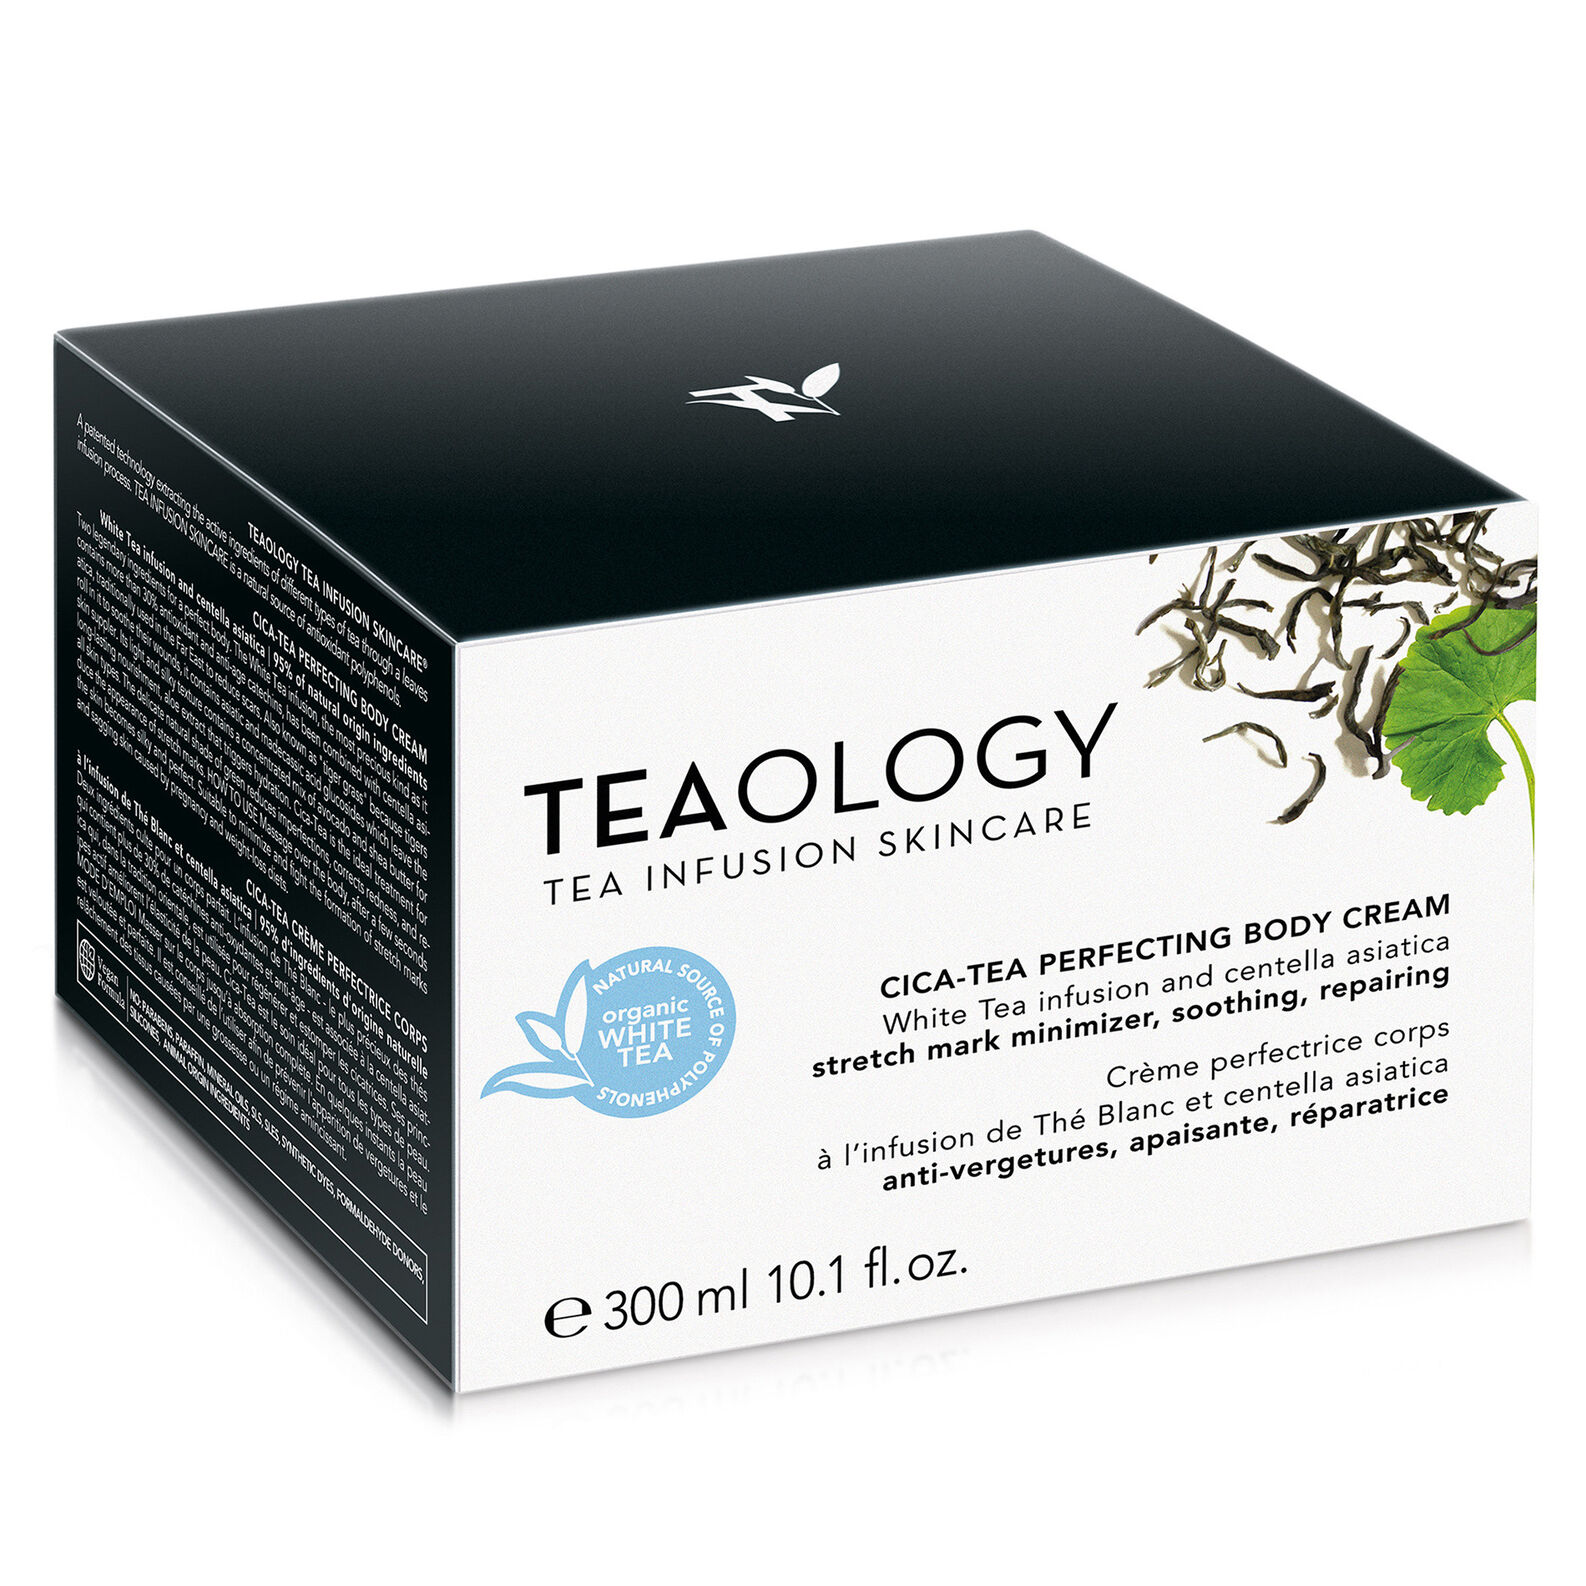 Teaolgy Cica-Tea Perfecting Body Cream 300 ml